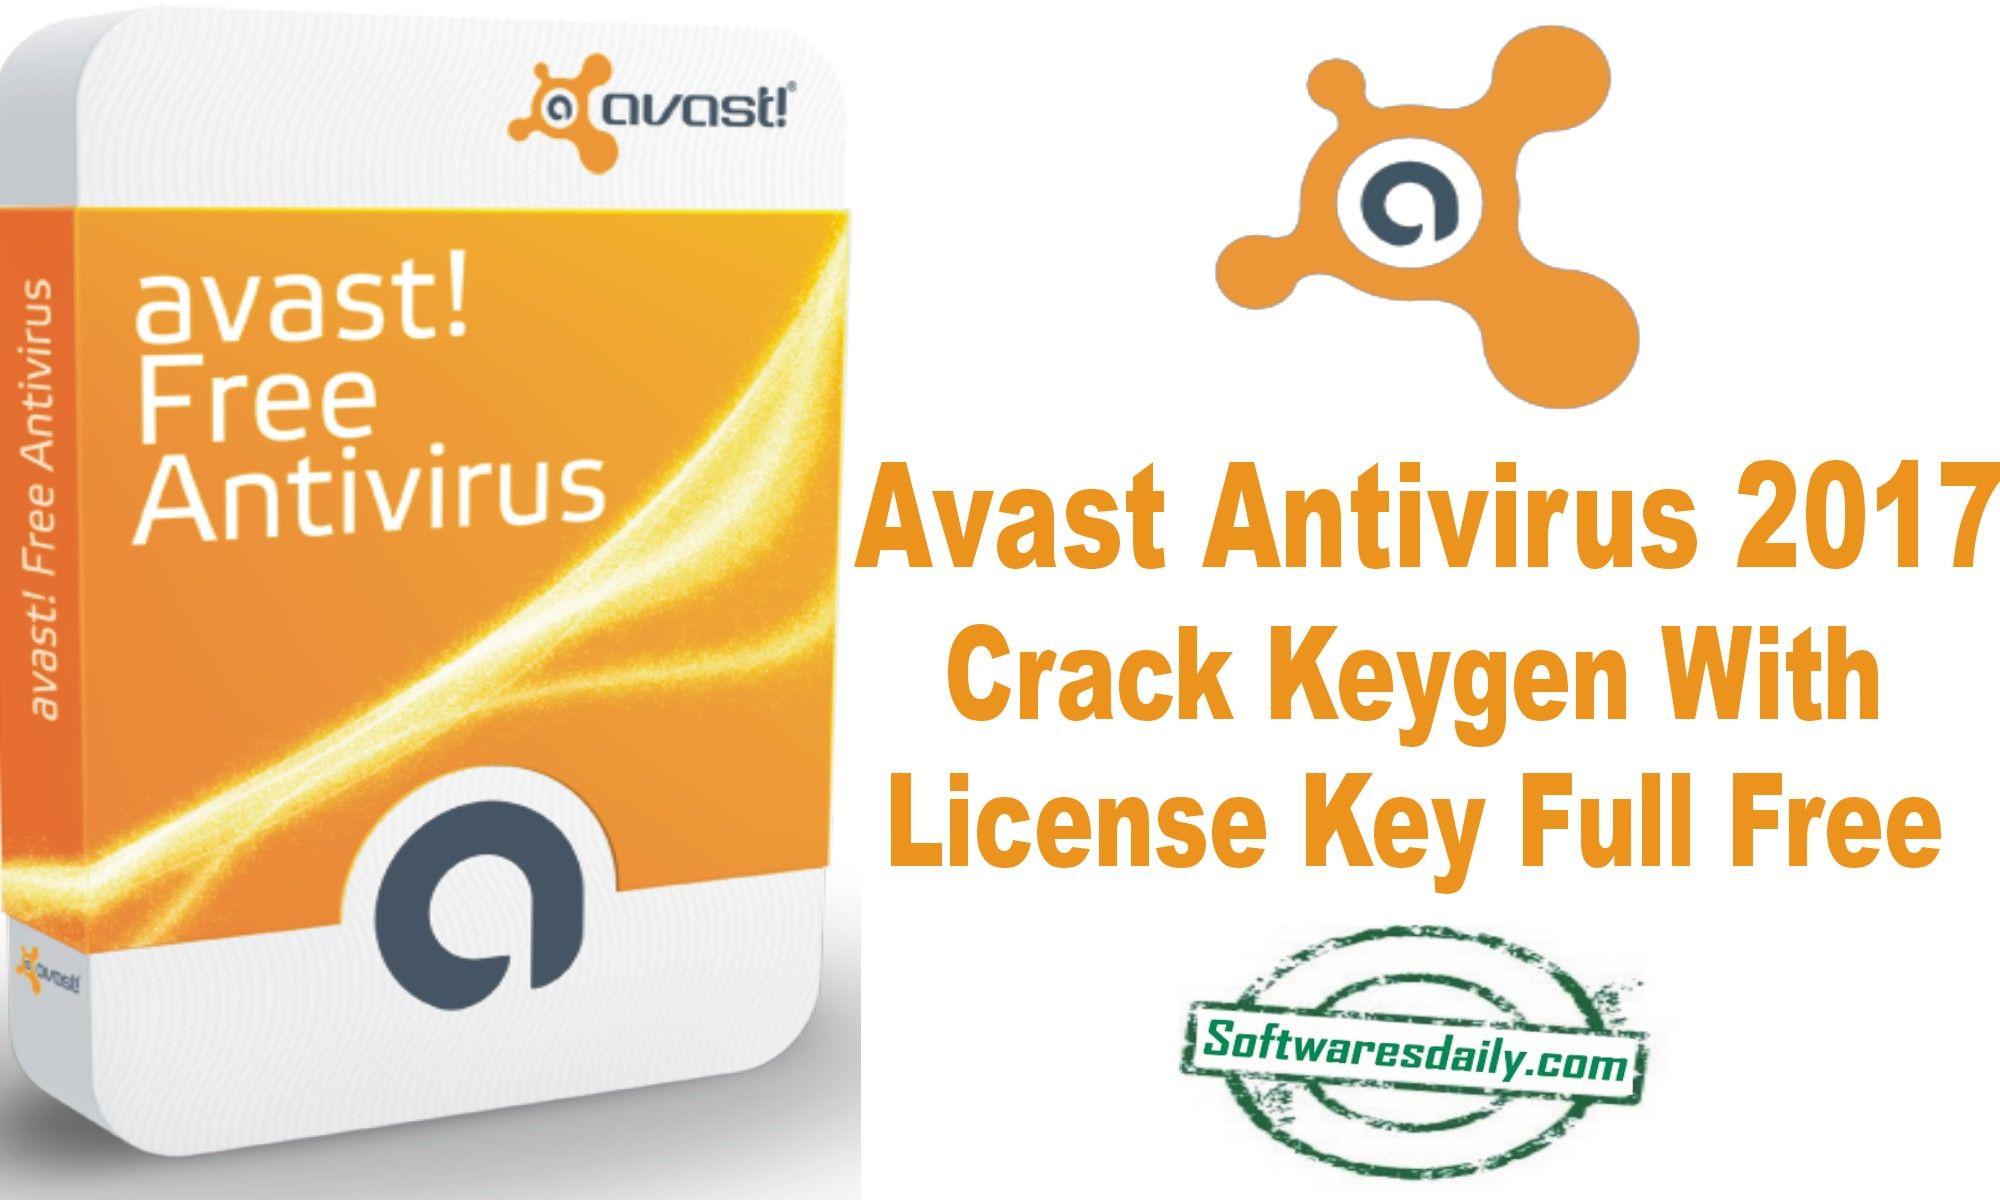 avast antivirus free crack keygen download